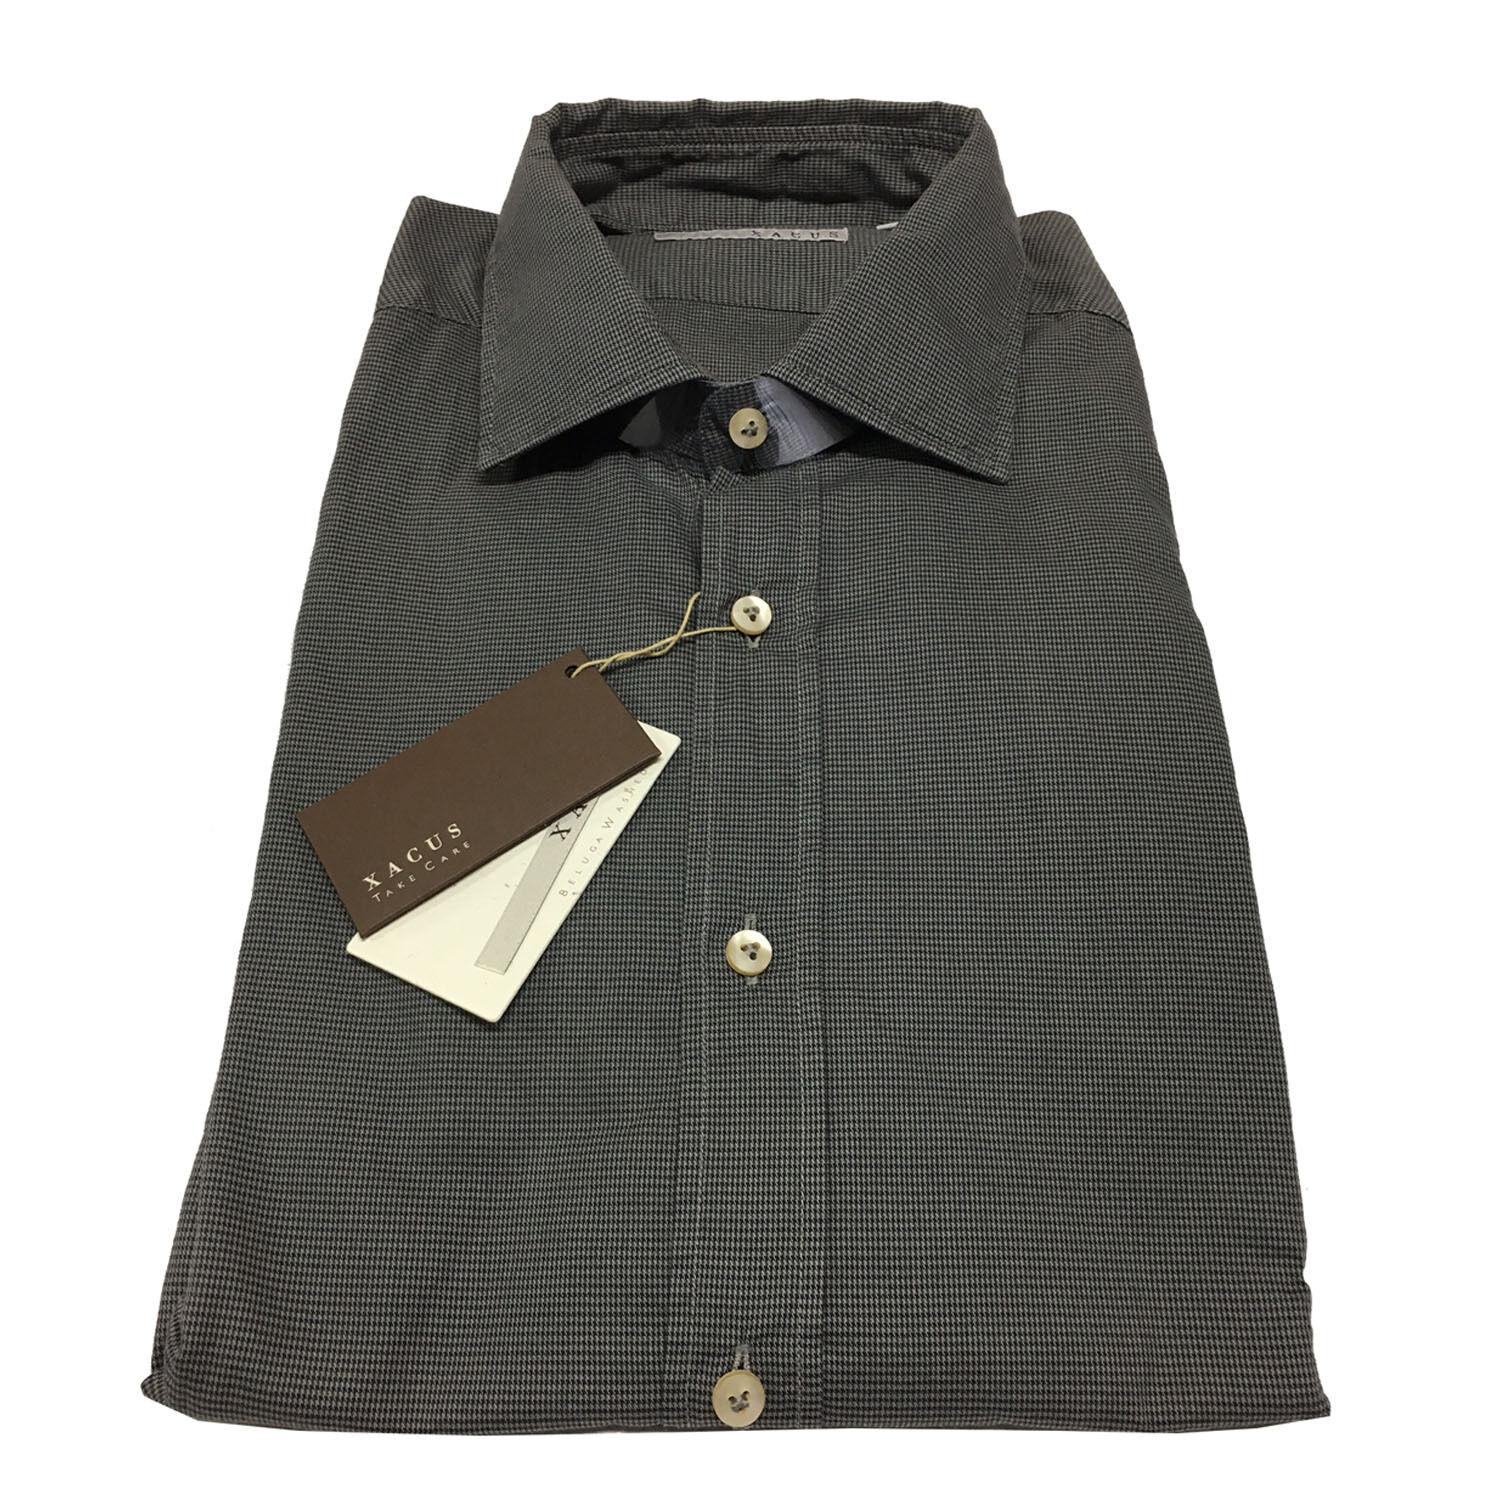 XACUS men's shirts Vichy charcoal 100% cotton slim fit